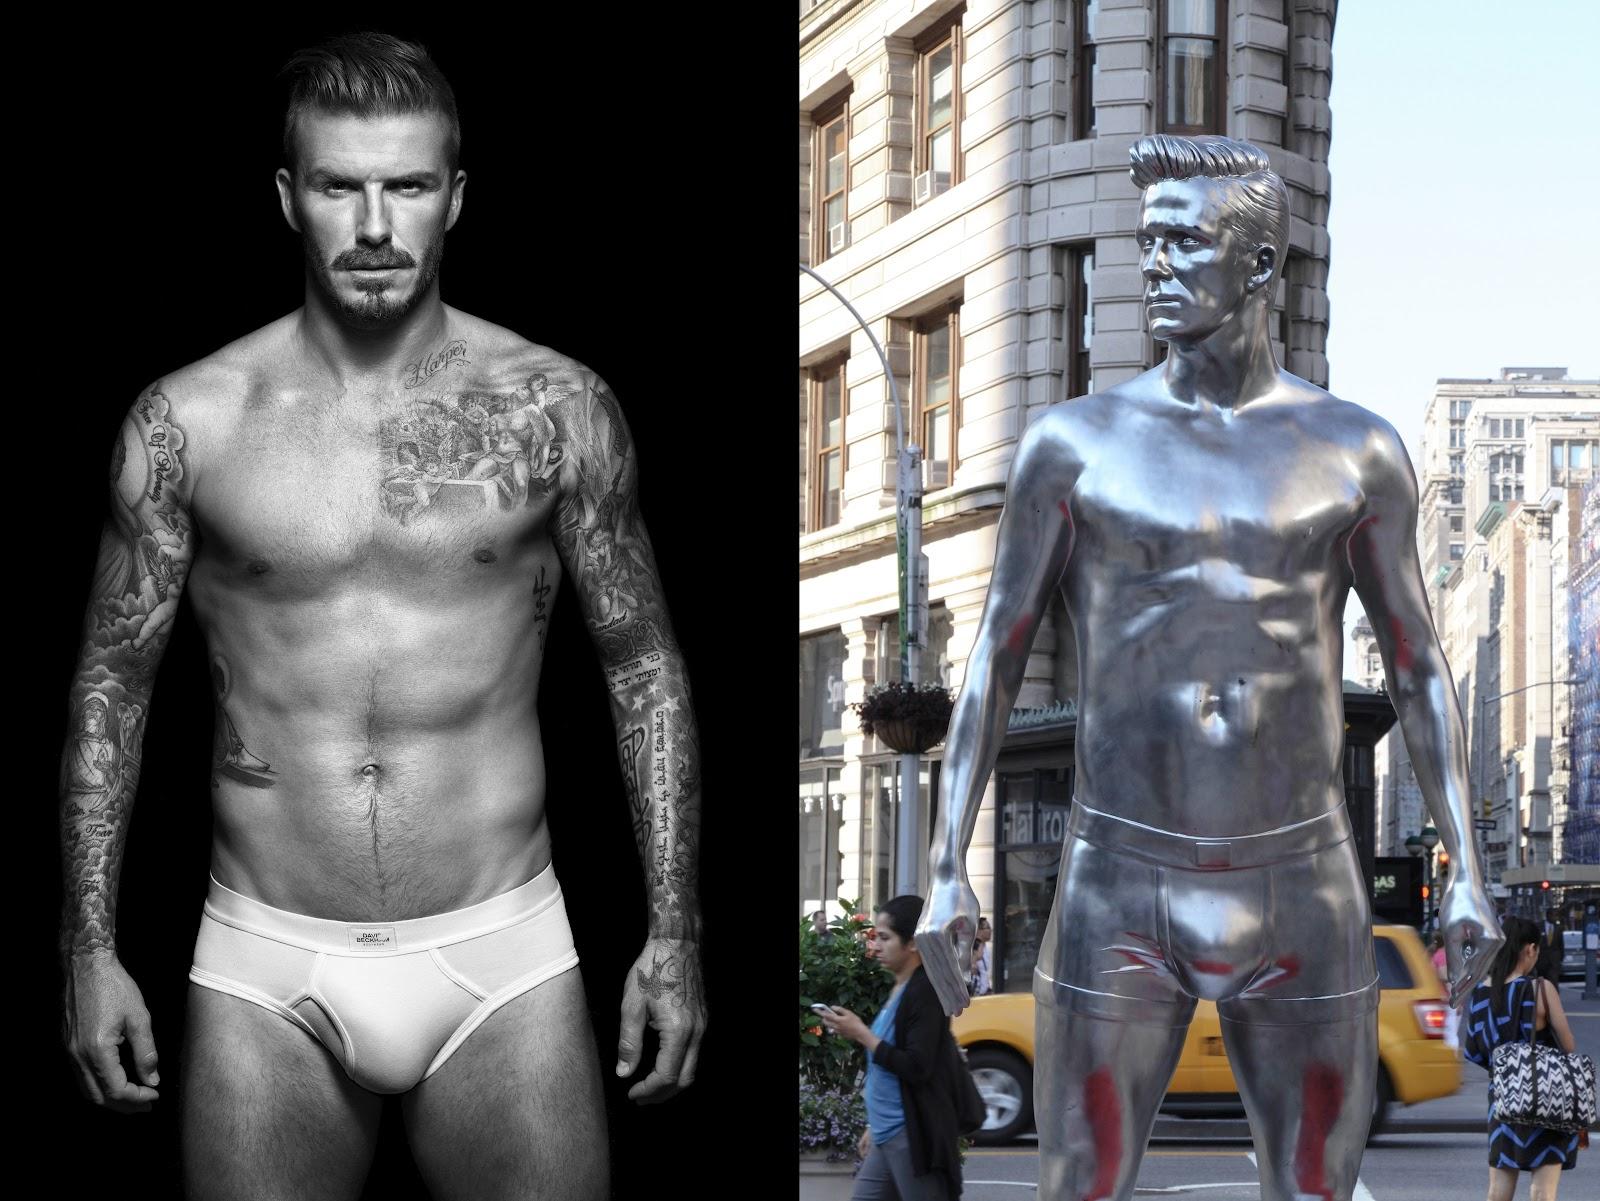 Beckham The man who broke football's gay taboo? - CNN